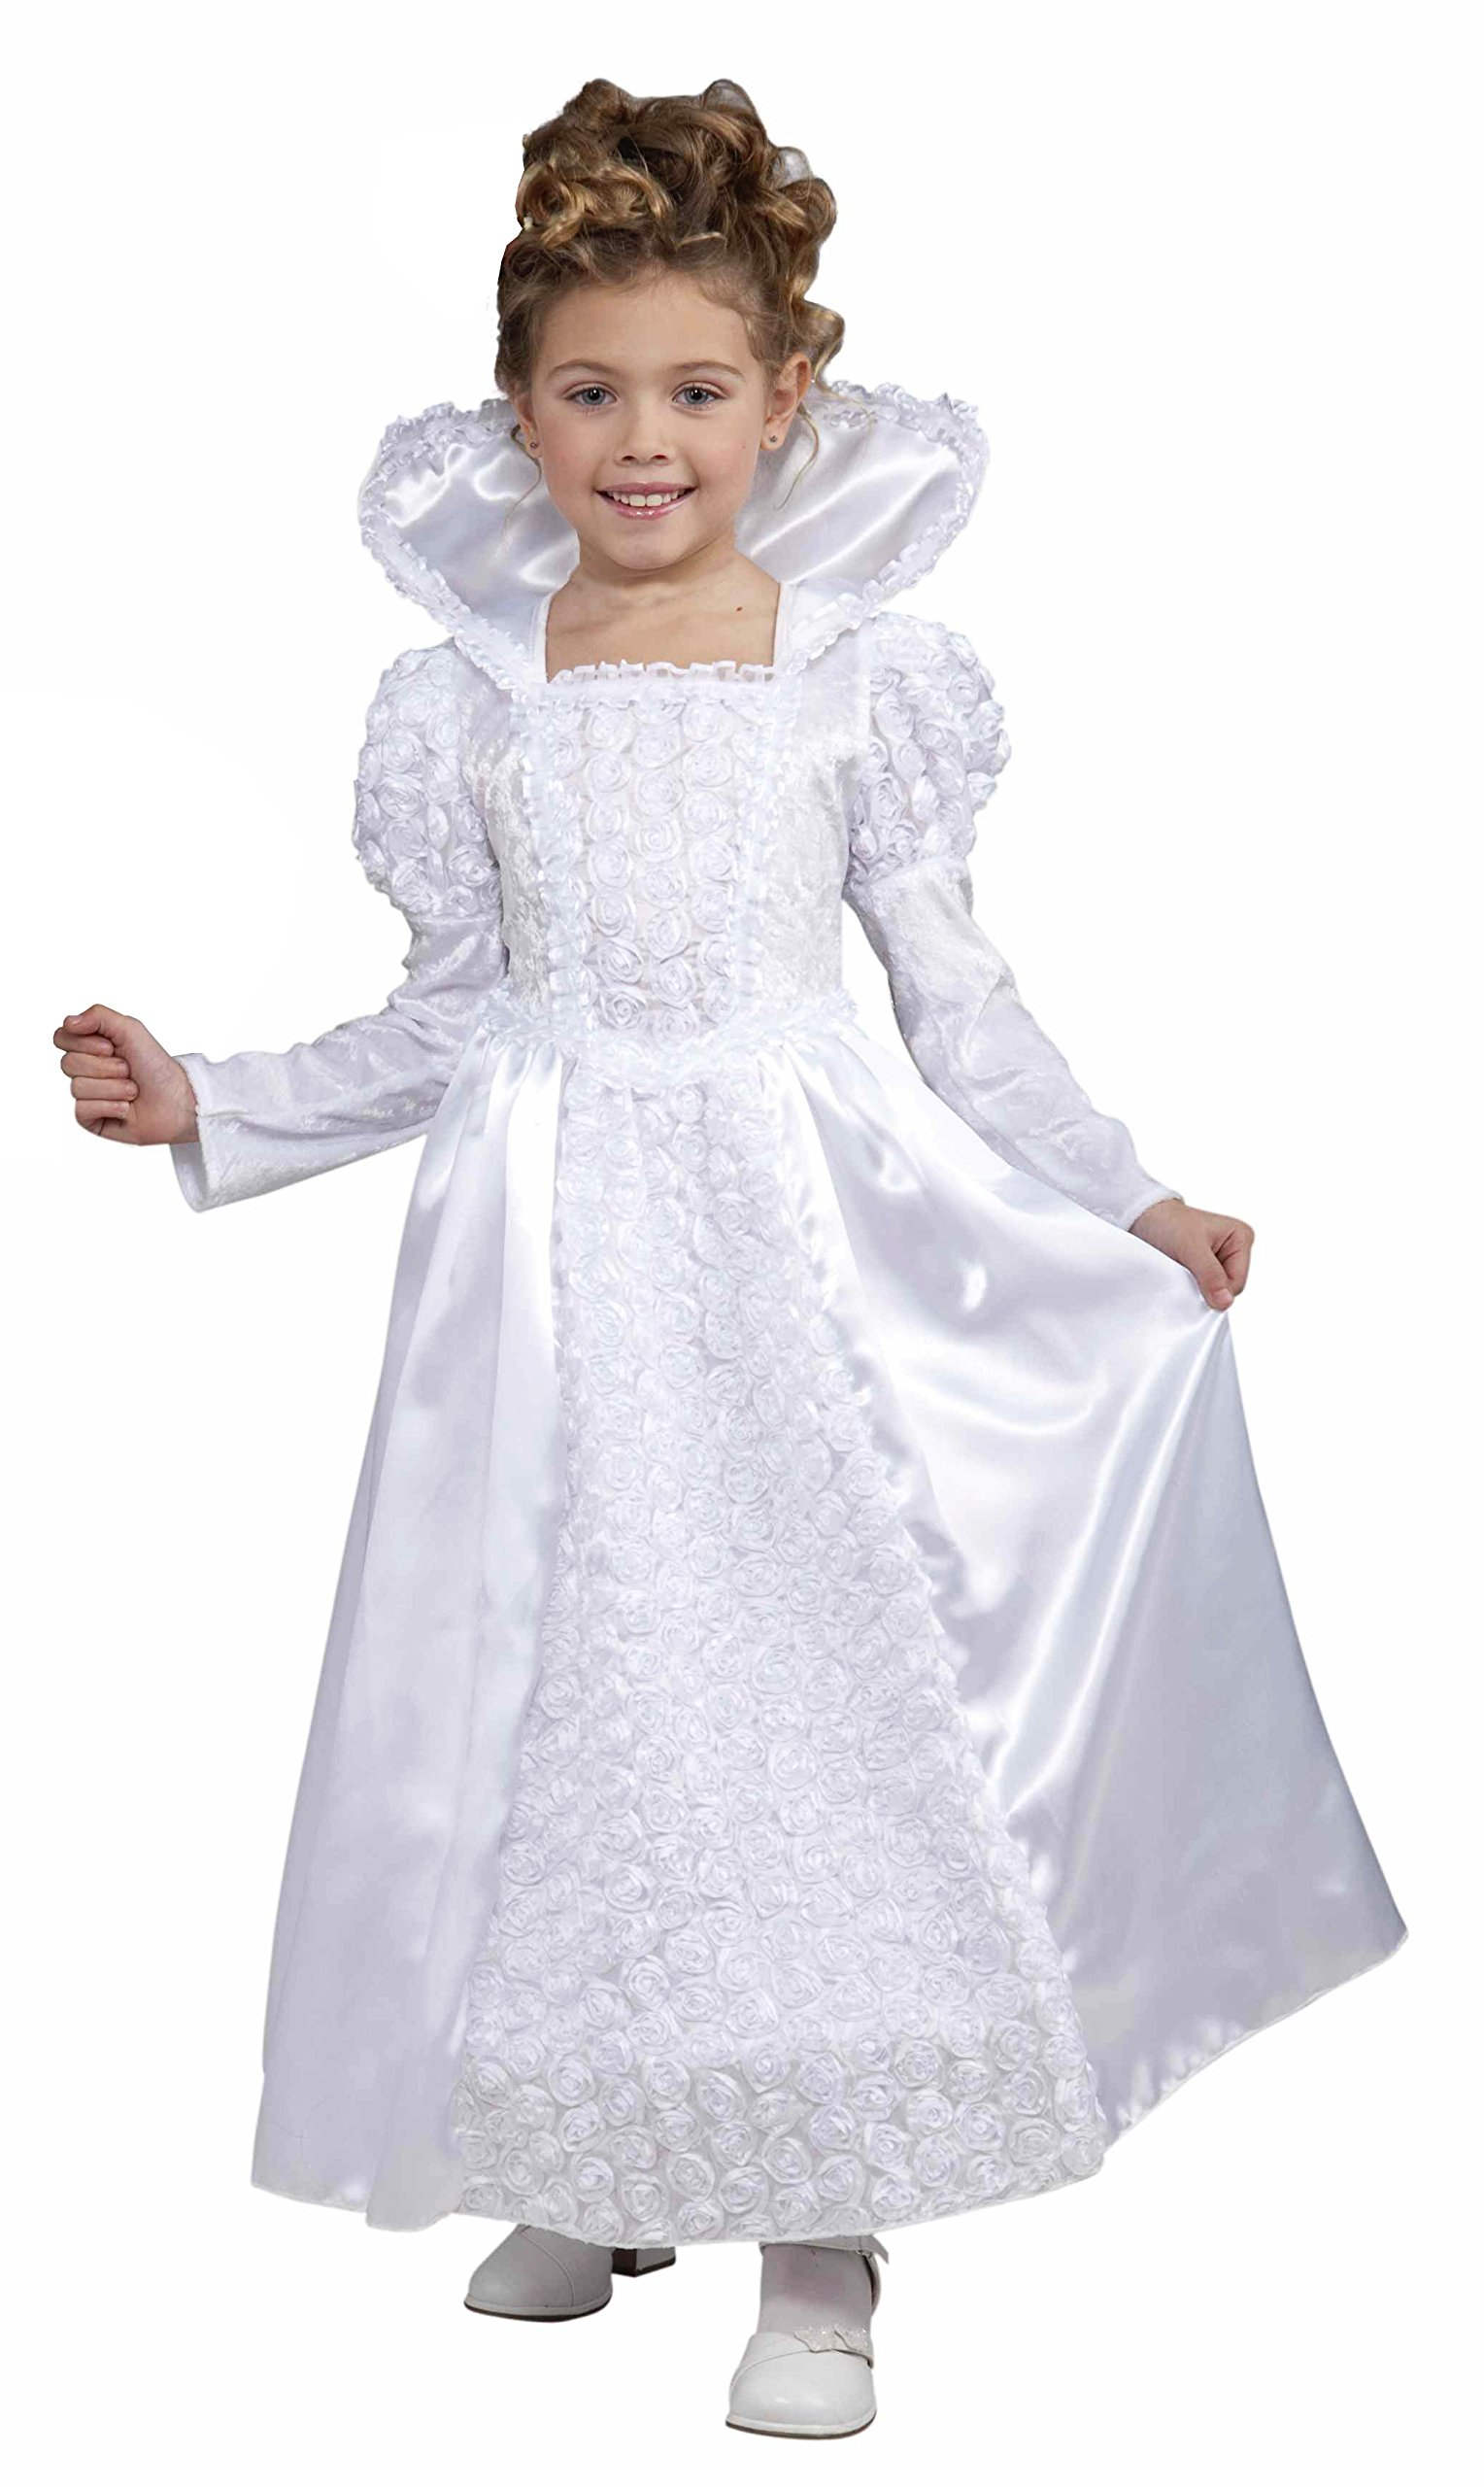 Forum Novelties Deluxe Designer Collection Bride Princess Costume, Child Small